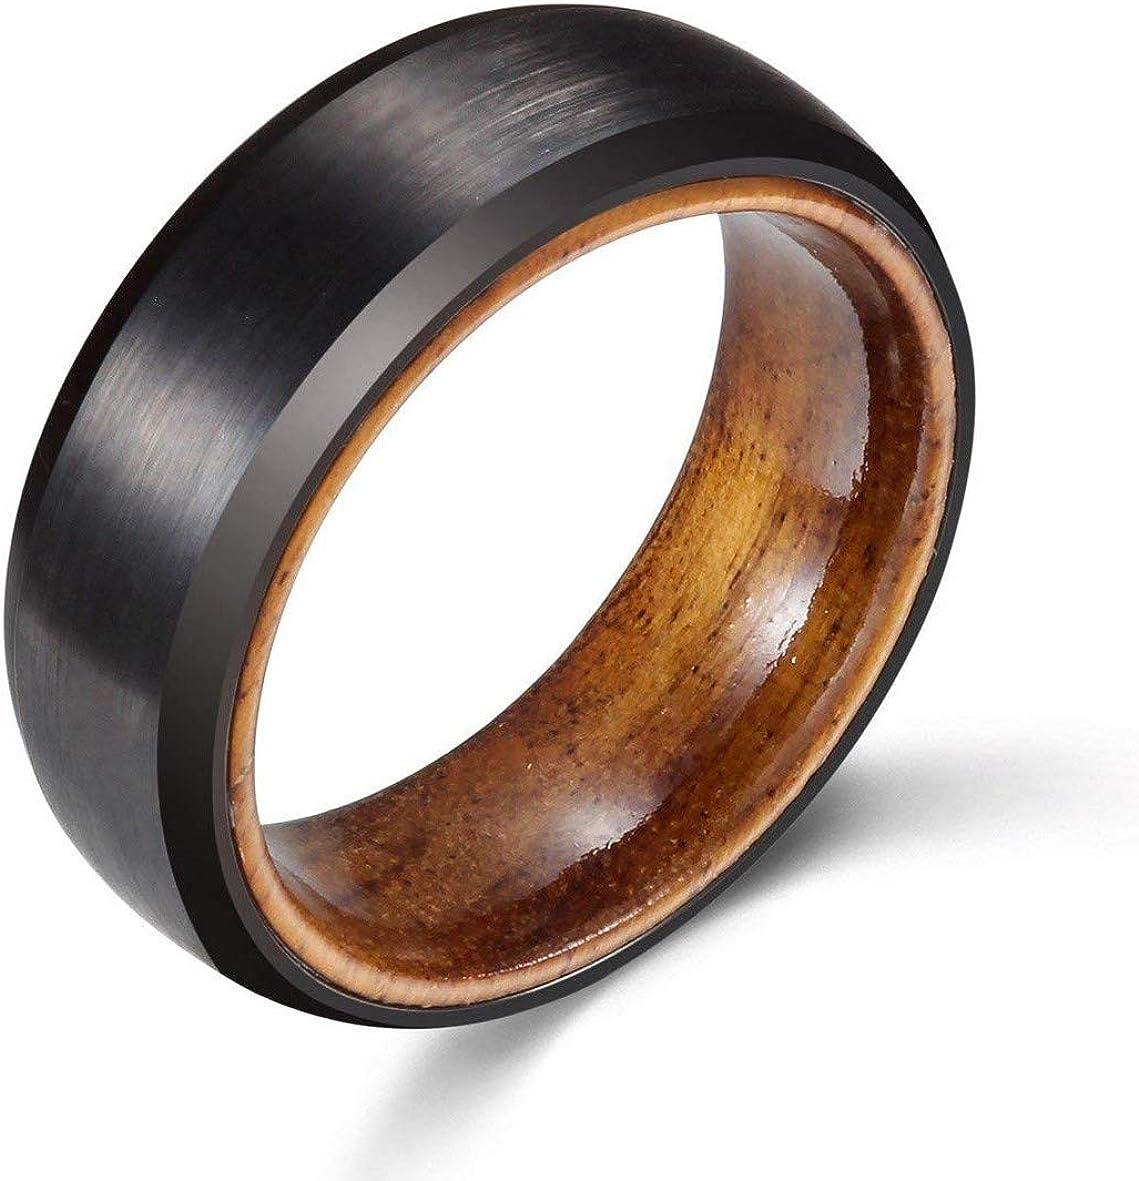 WASOLIE Mens 8mm Tungsten Rose Wood Sleeve Wedding Ring Engagement Band Black Matte Finish Comfort Fit Flat Style/Beveled Edge